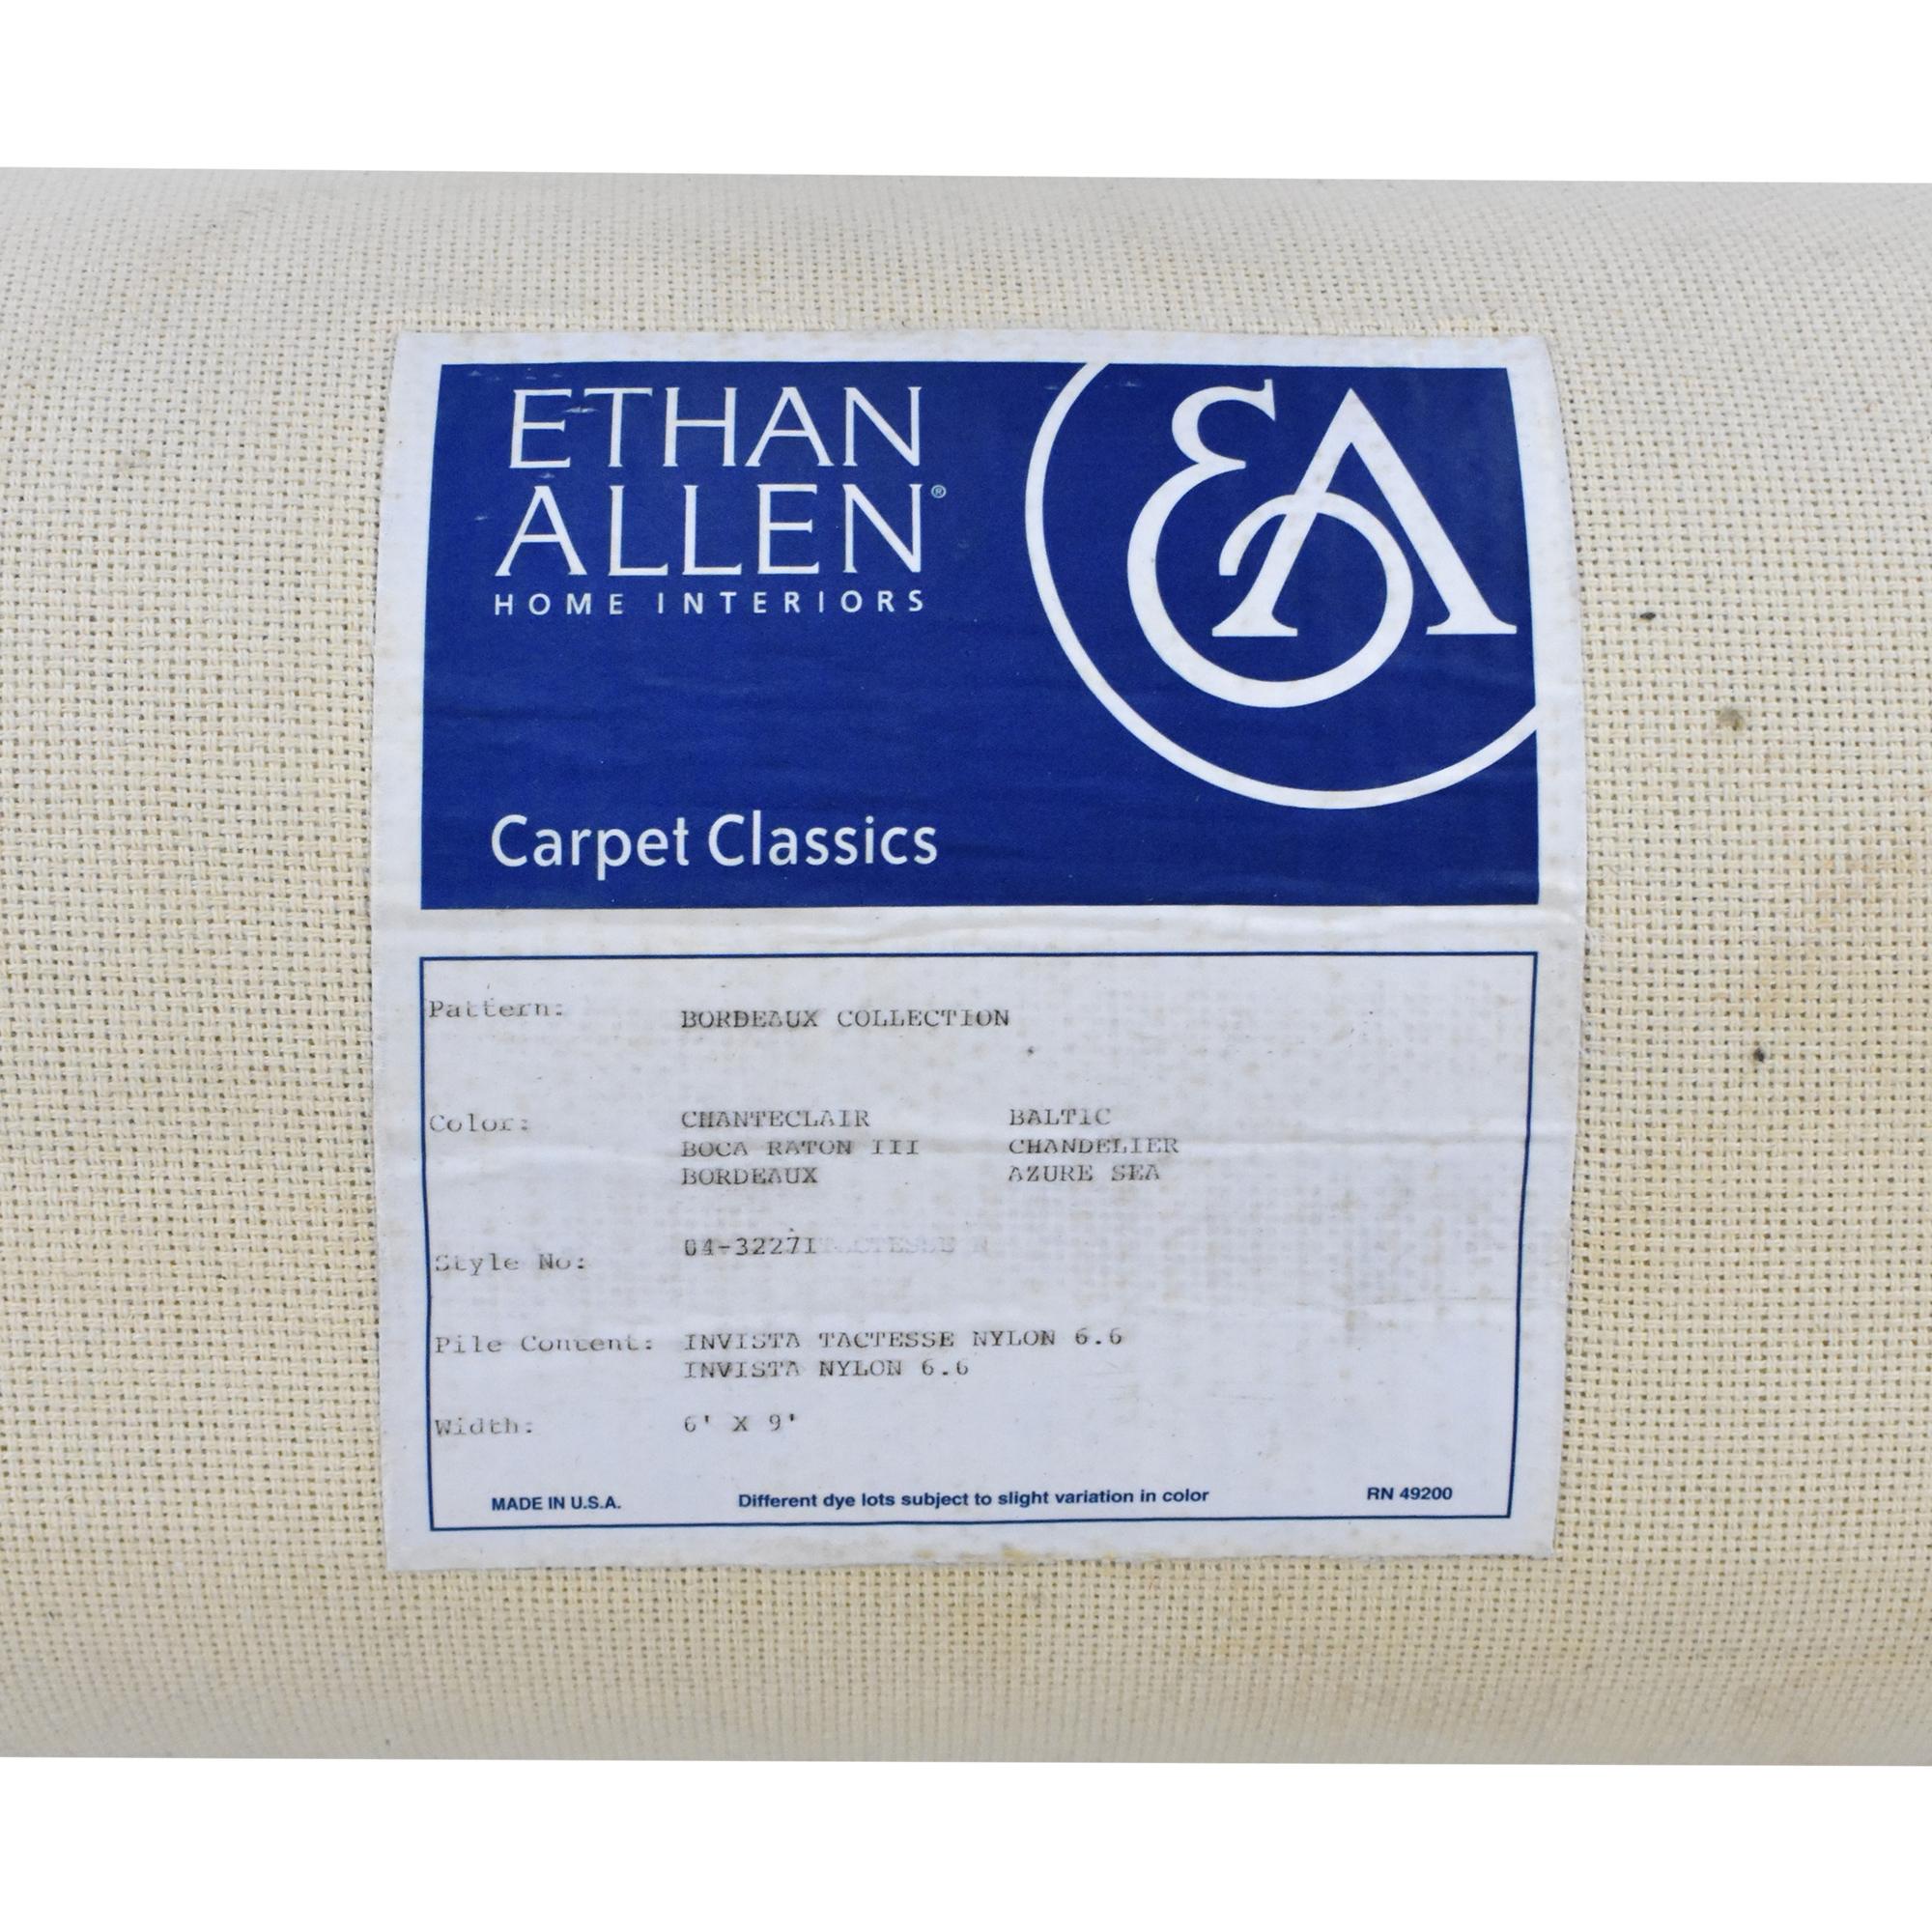 Ethan Allen Ethan Allen Bordeaux Collection Area Rug blue & white